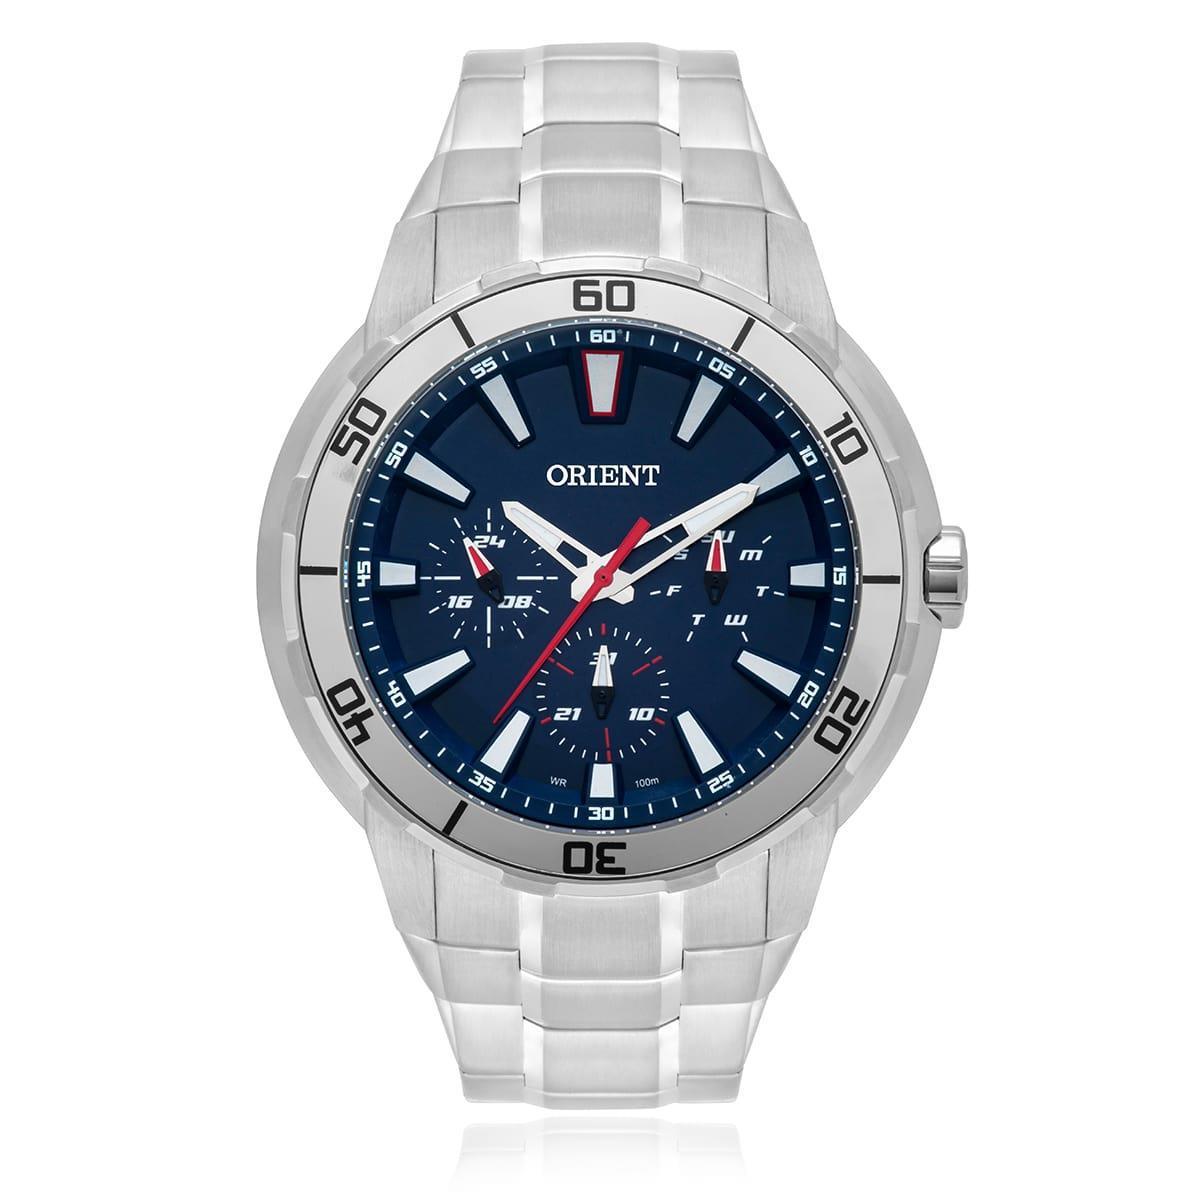 df4e5939b91 Relógio Masculino Orient Analógico MBSSM077 D1SX Fundo Azul ...